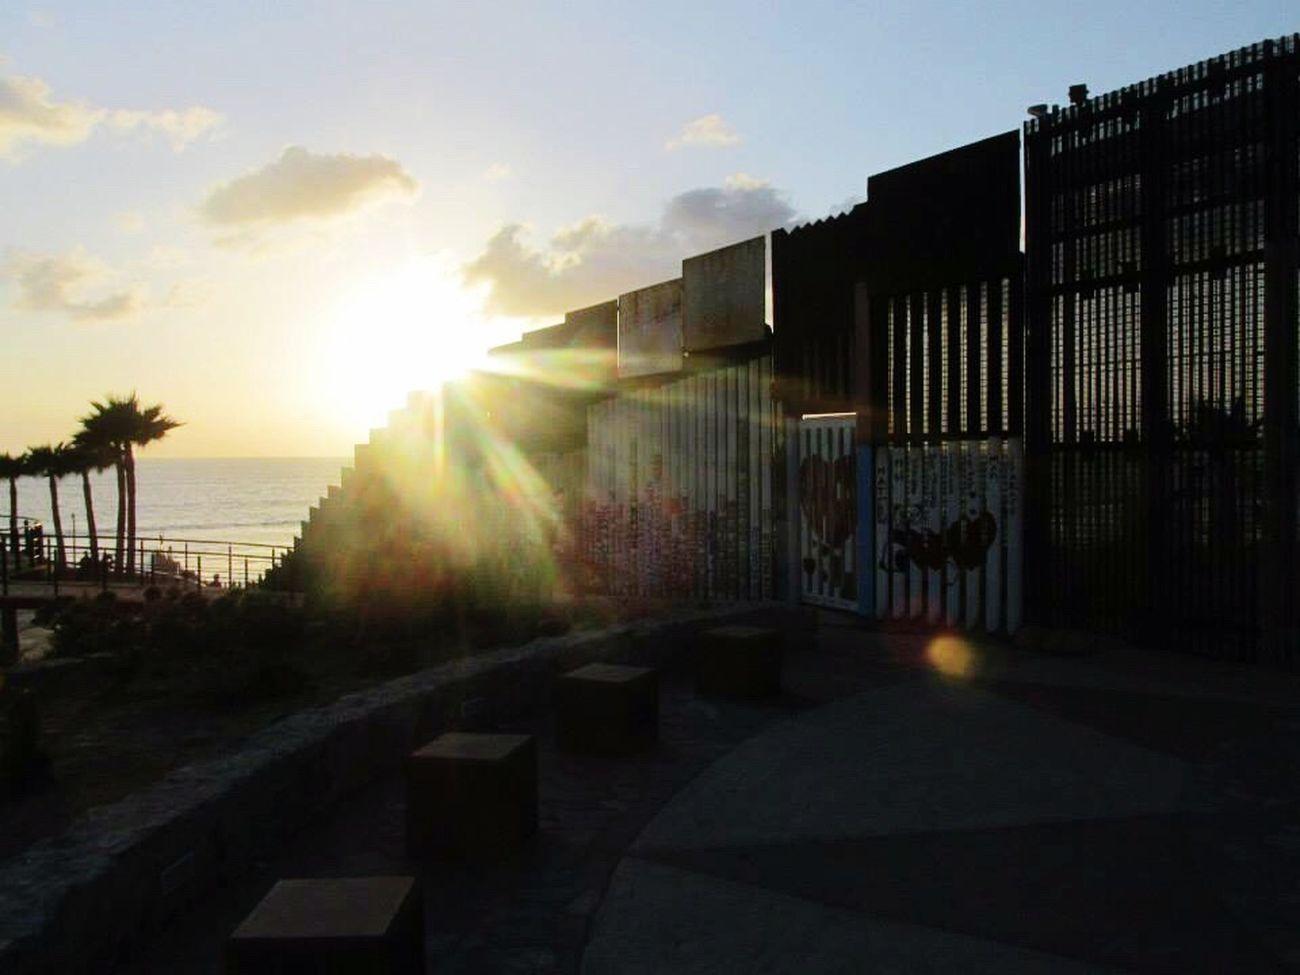 Tijuana, México 2015 Tijuana San Diego Border Wall Mexico USA Muro  Frontera Vianeycarre Sunset Incredible